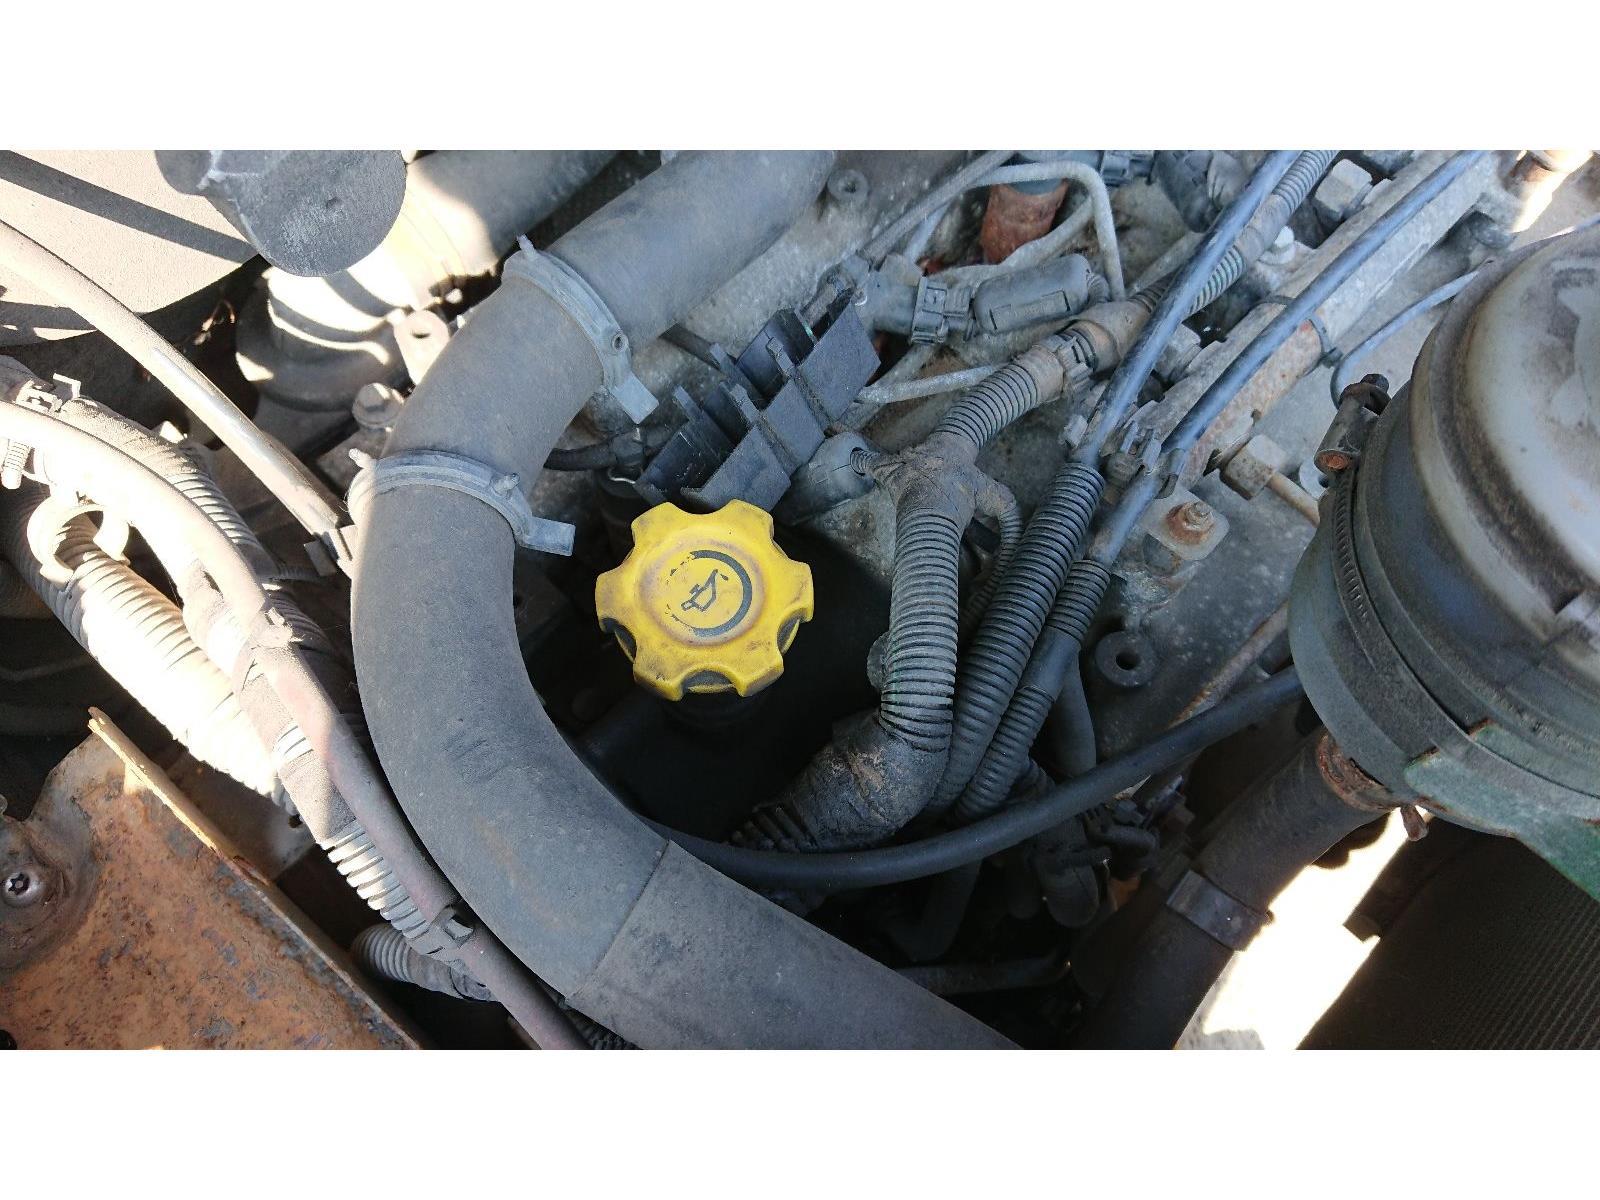 ... ENGINE LDV Maxus 08 On 2.5 120Bhp Diesel VMR425 (R2516L) & WARRANTY -  7380191